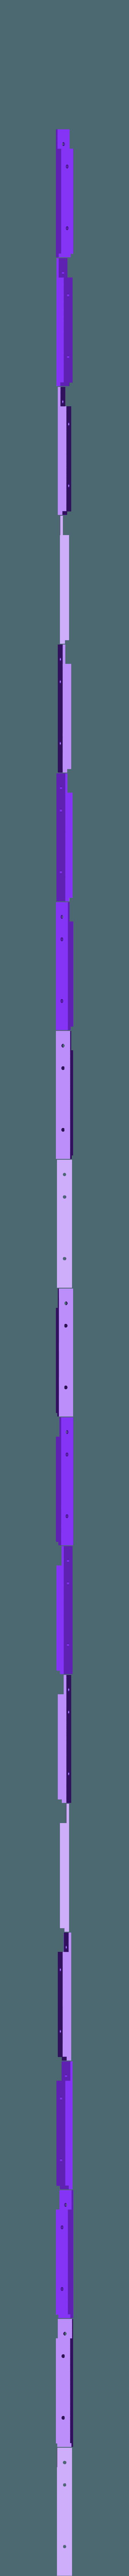 side_LT_upright_frame.stl Télécharger fichier STL gratuit Ghostbuster Ghostbuster Ghosttrap • Modèle pour impression 3D, SLIDES